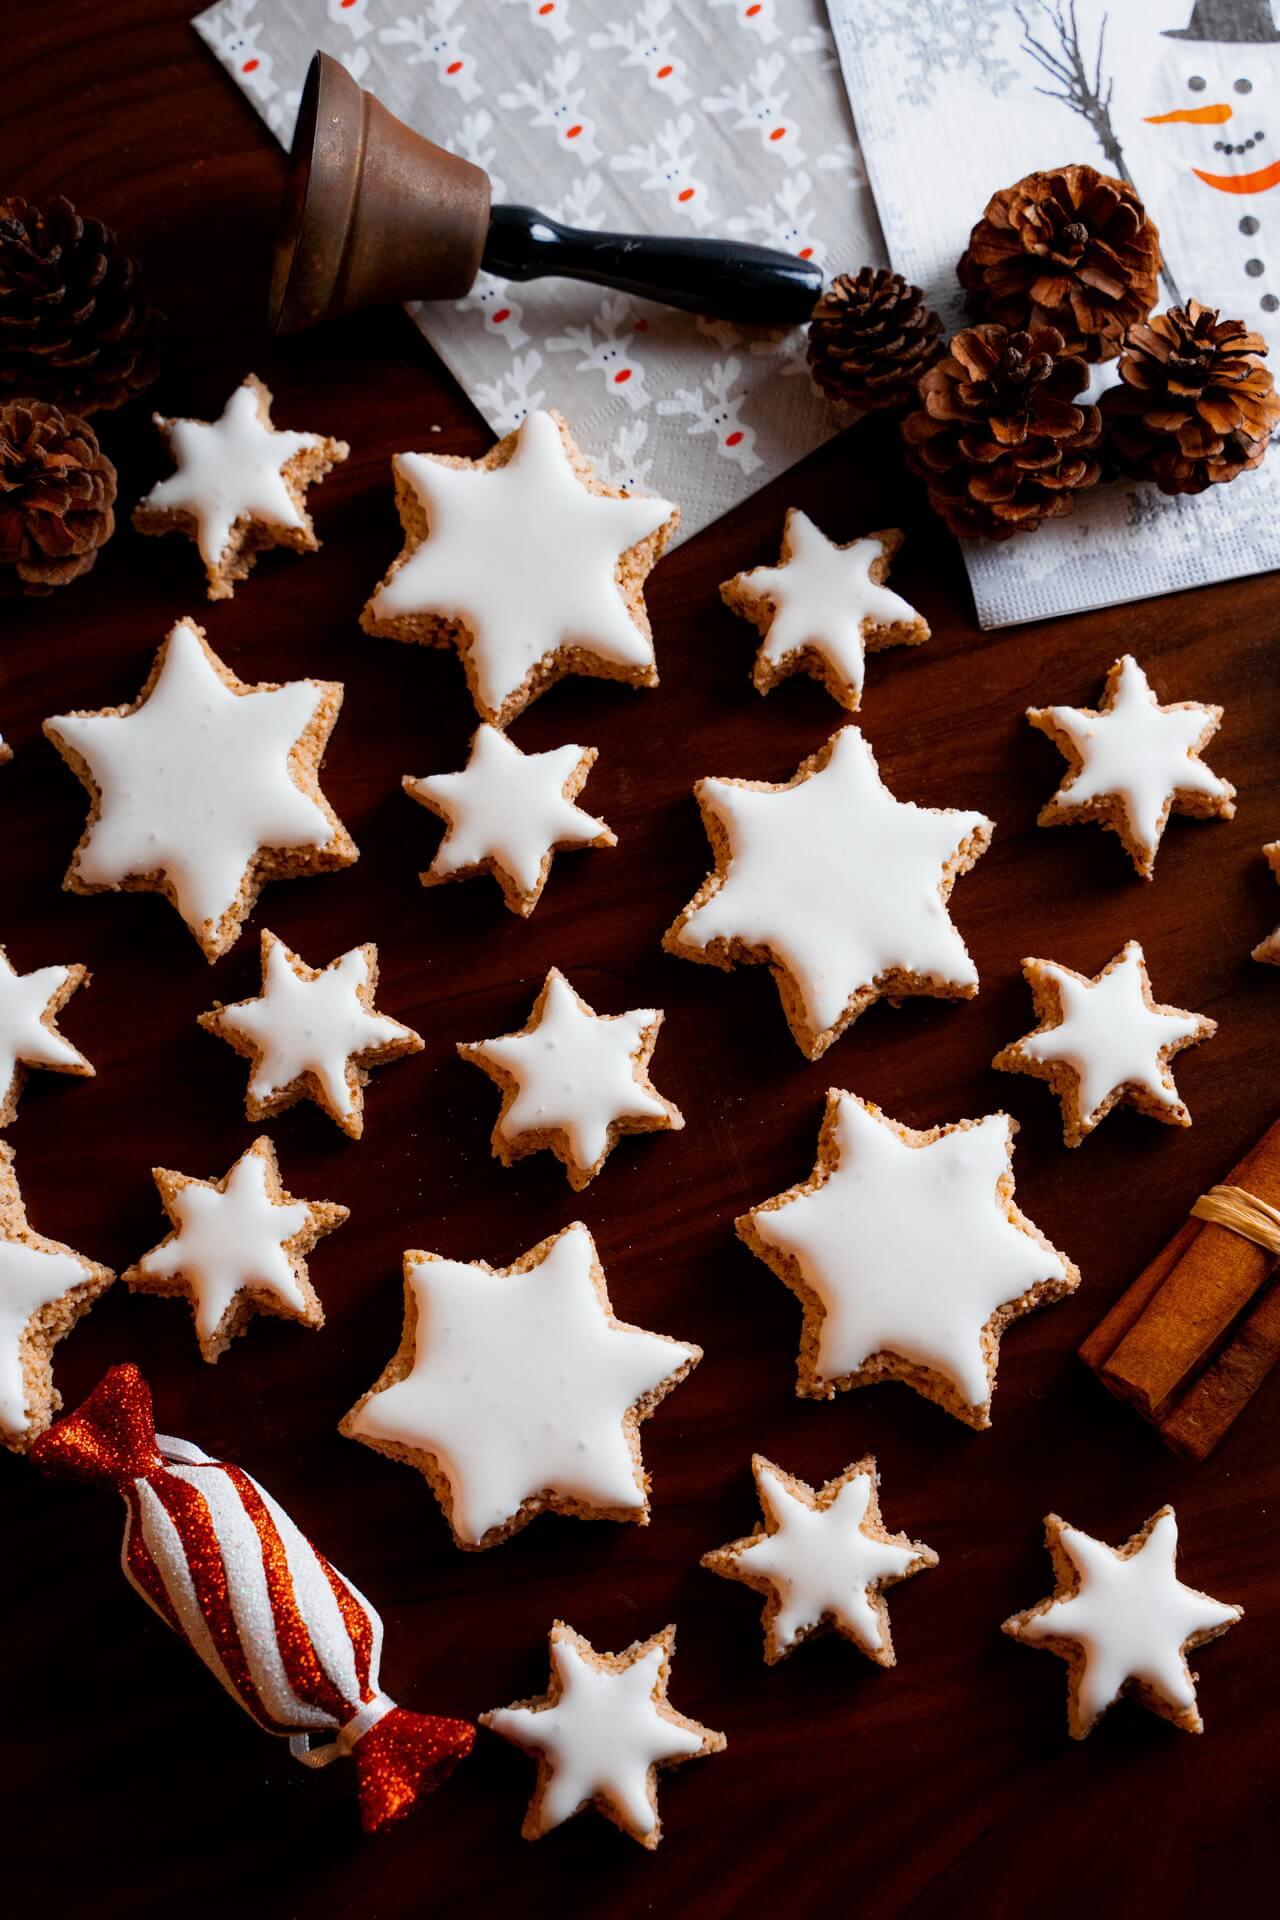 Zimtsterne Cinnamon Star Christmas Cookies On Kitchen Counter Vertical